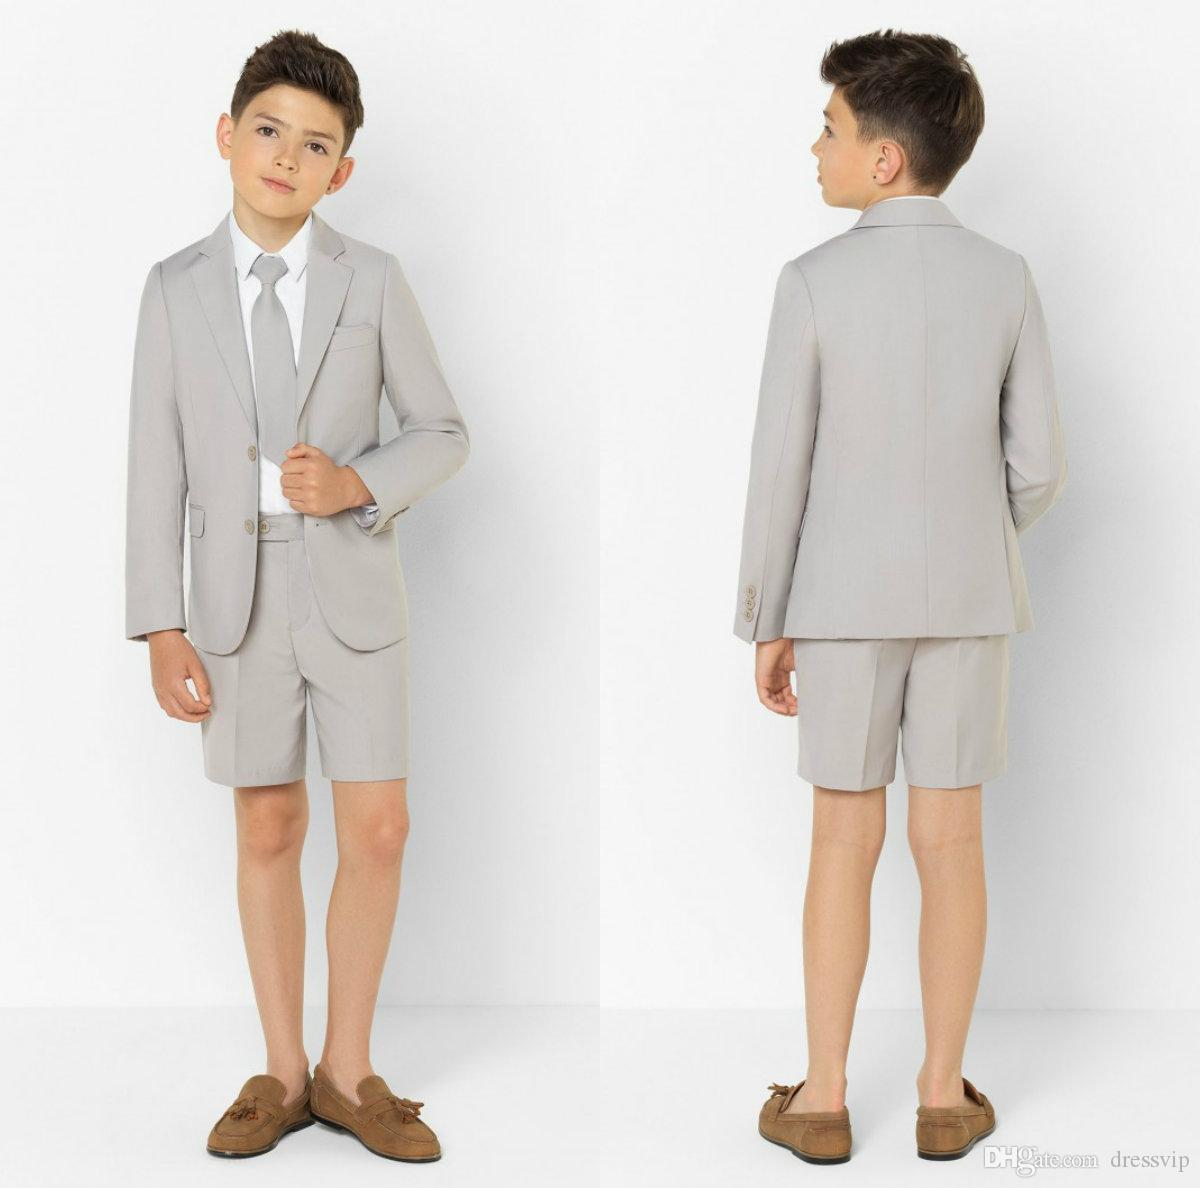 Summer Little Boy Formal Suits Dinner Tuxedos for Beach Wedding Party Boy Groomsmen Kids Children Prom Suit Formal Wear (Jacket+Pants)